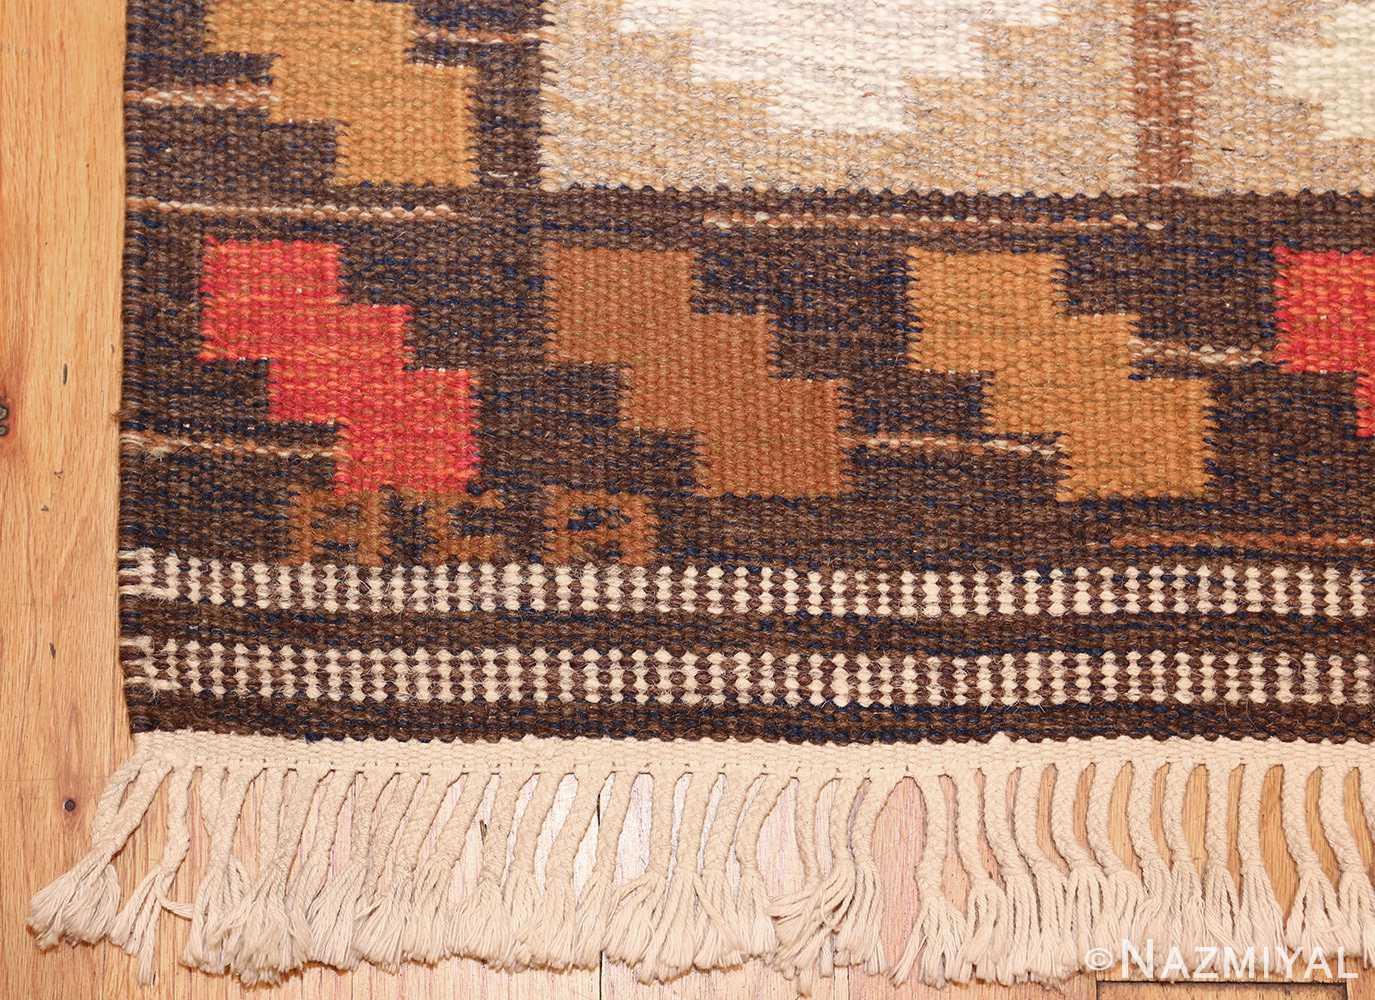 vintage swedish kilim by ana joanna angstrom 48562 signature Nazmiyal